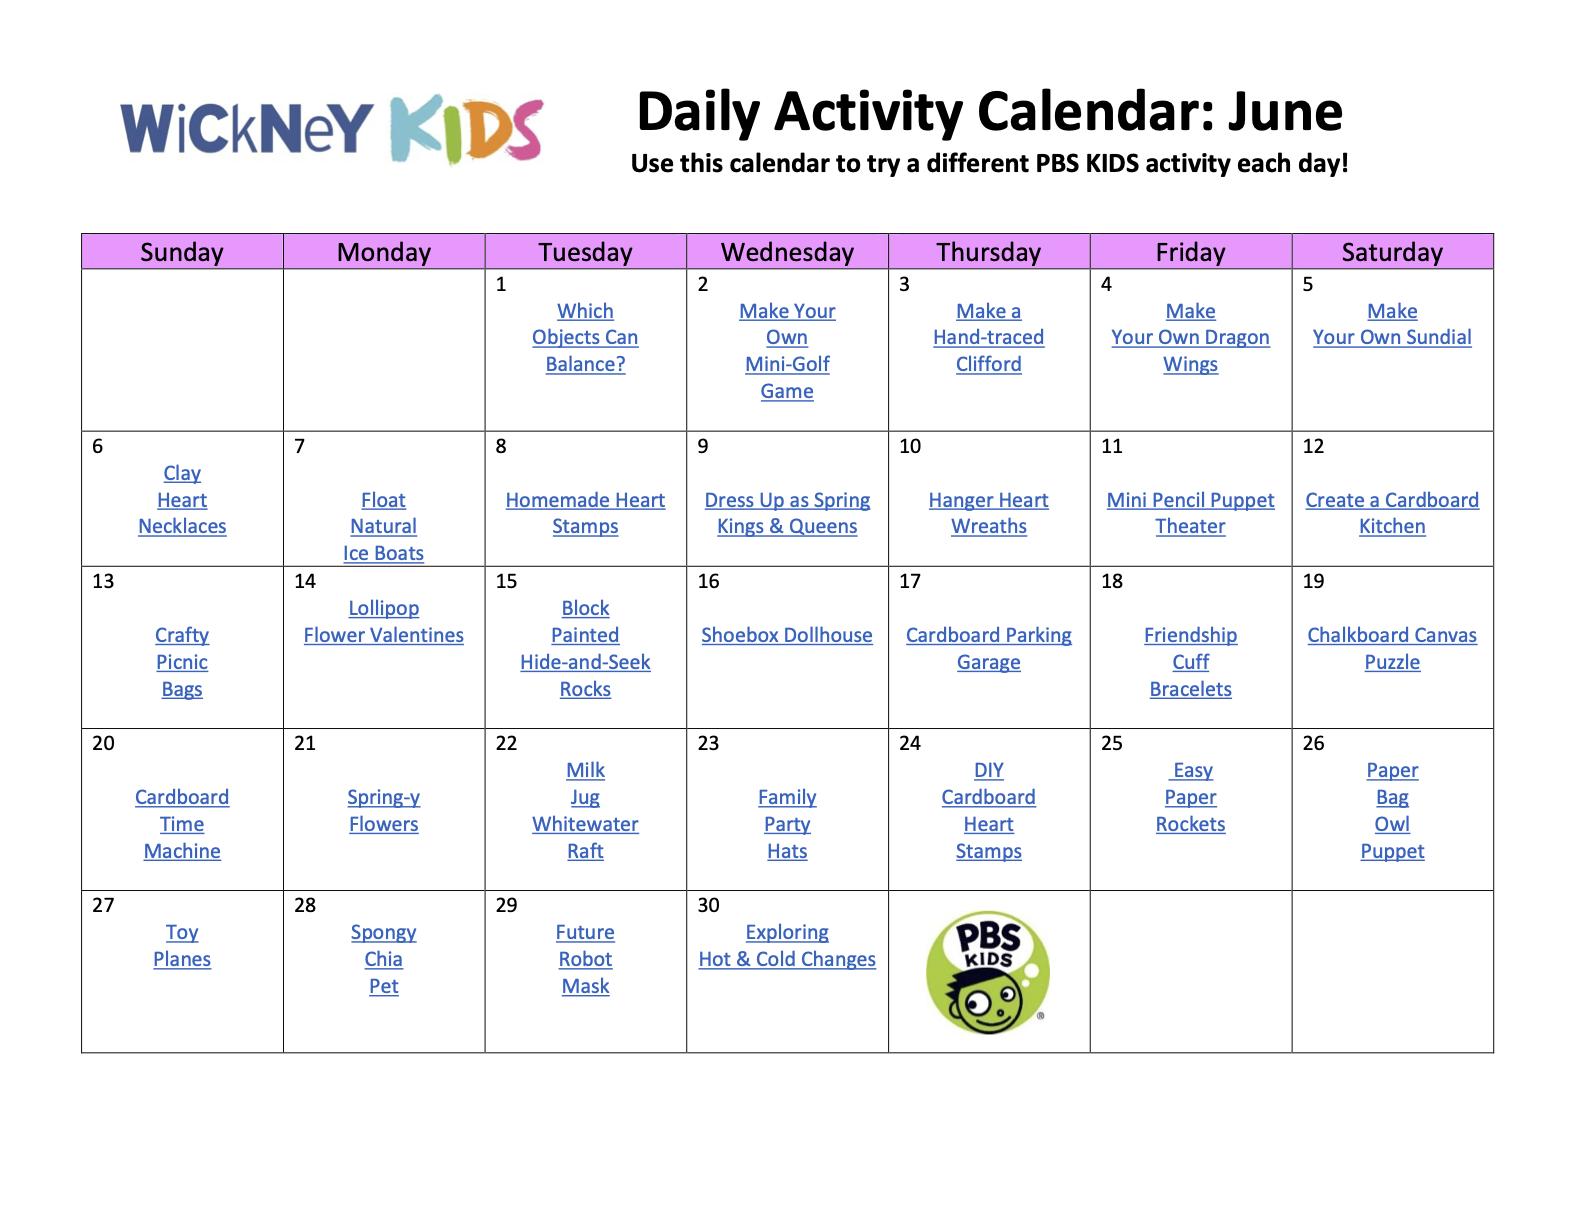 DailyActivityCalendar_June2021